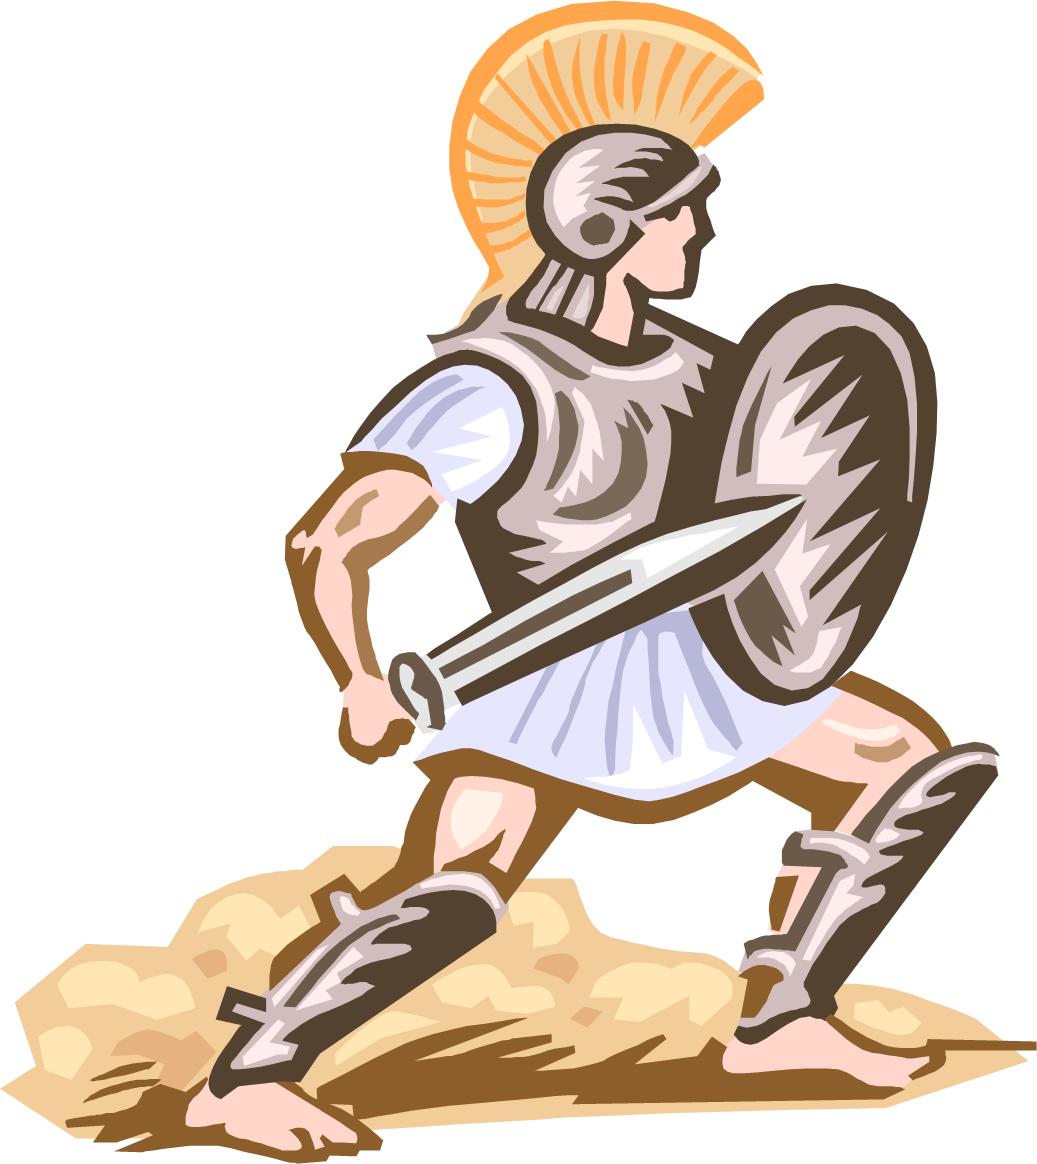 1037x1164 Clip Art Inspiration Roman Empire Clip Art Roman Empire Clip Art